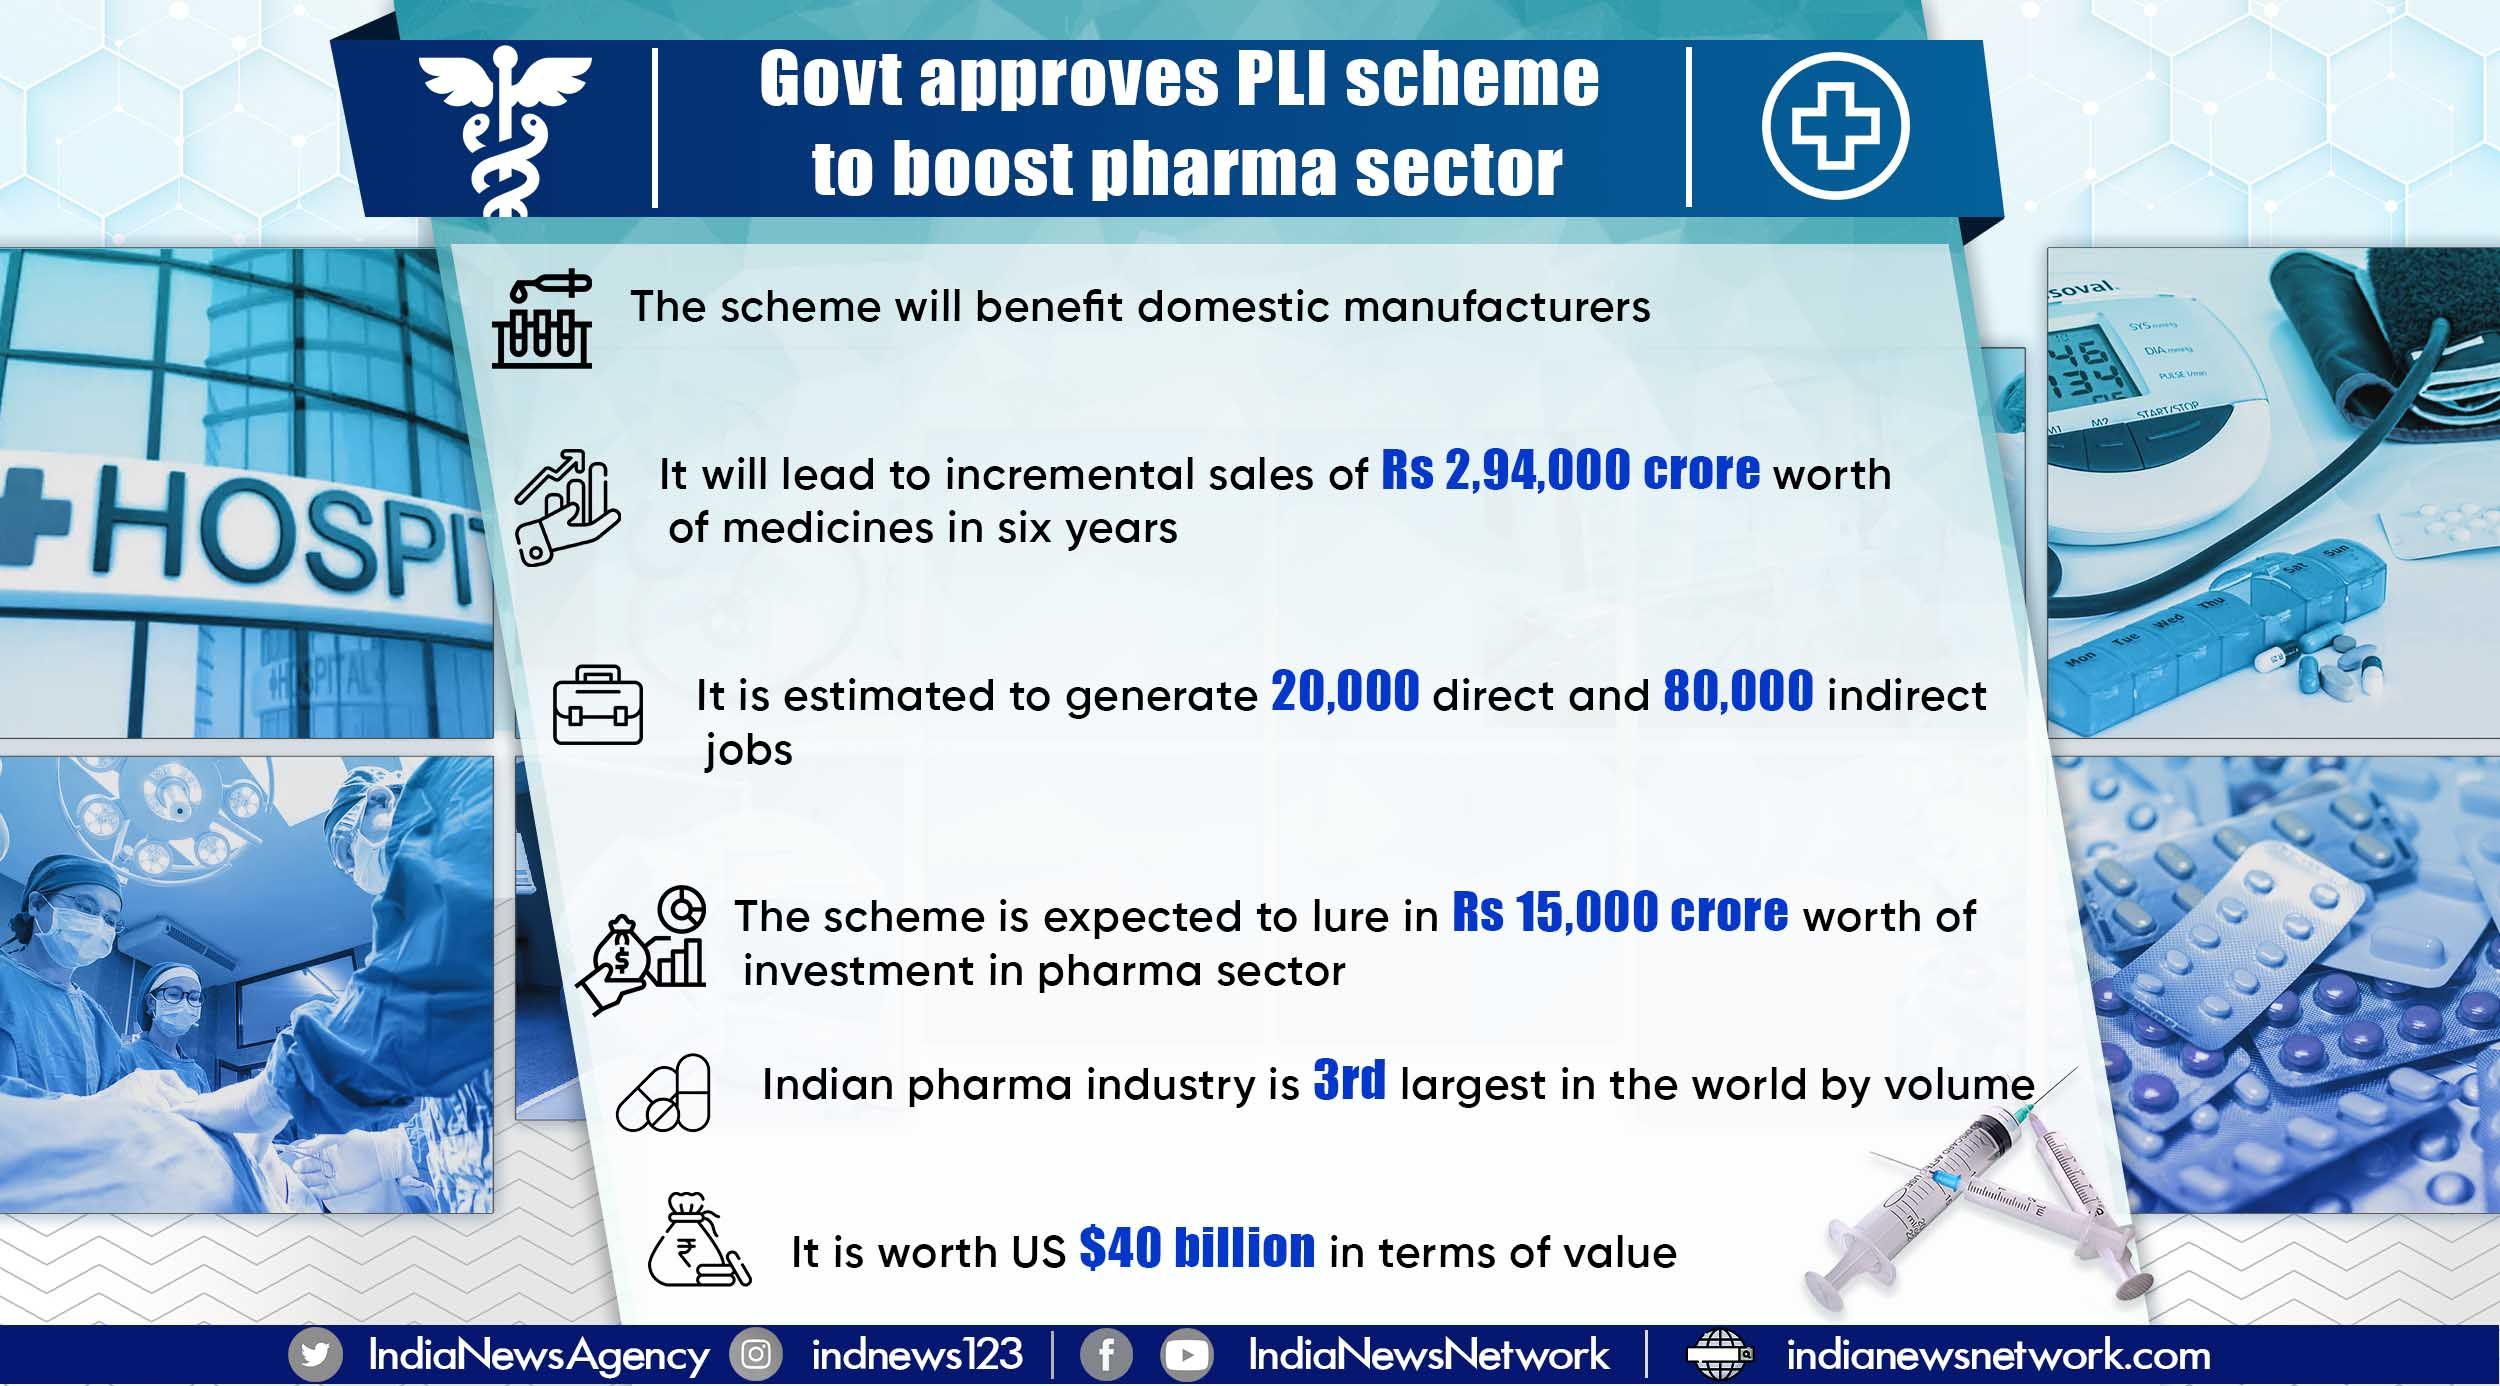 Govt approves PLI scheme to boost pharma sector